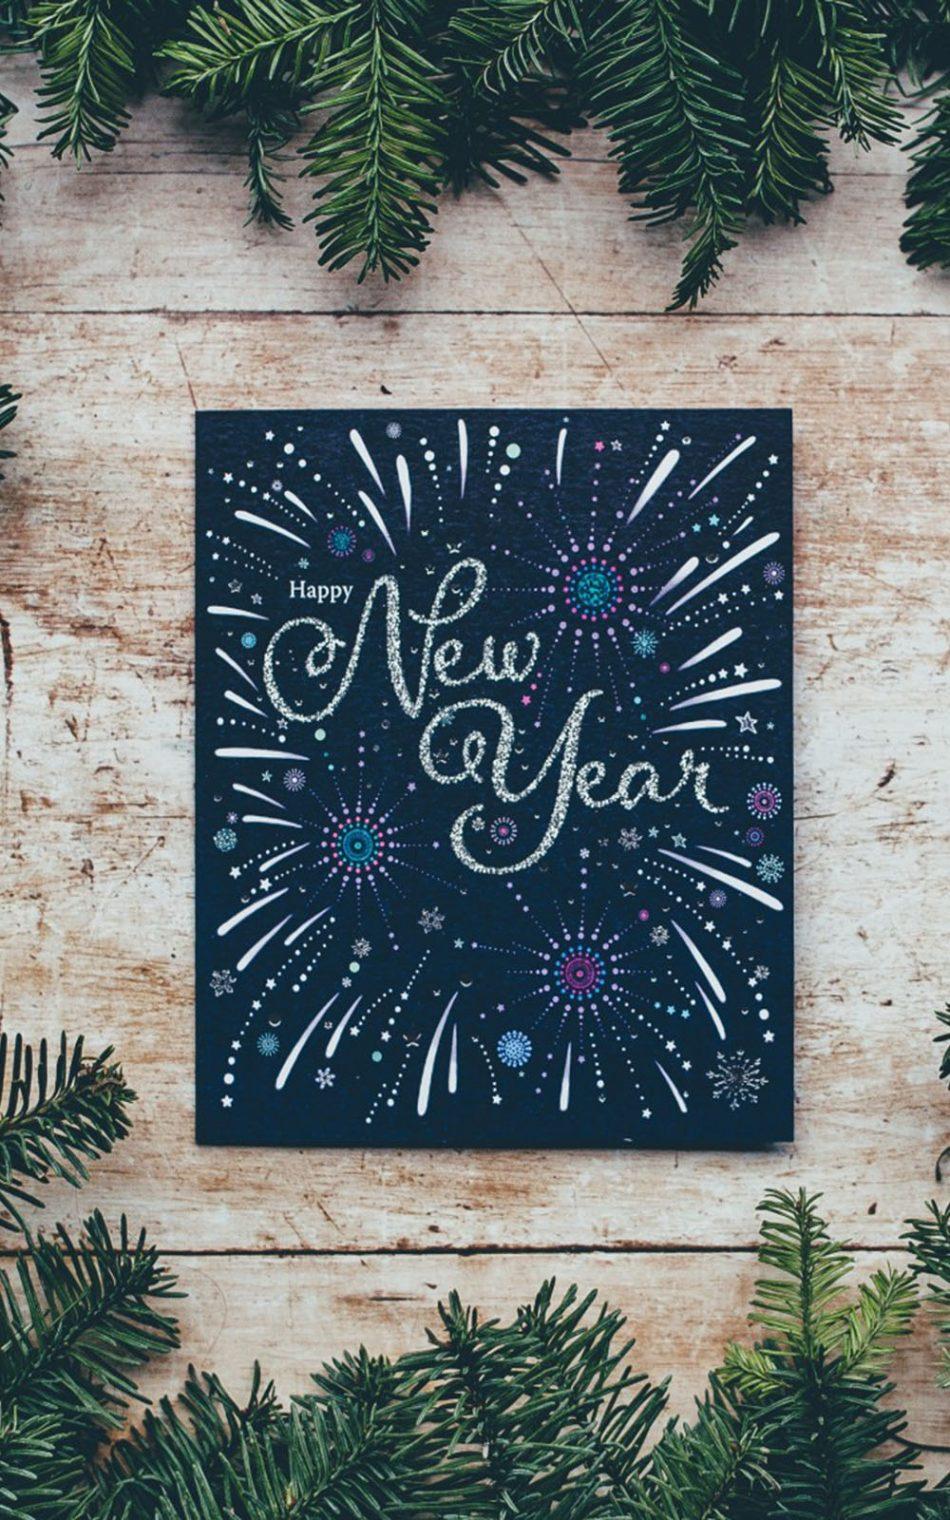 Happy new year hd photo hindi movie download 2020 bollywood